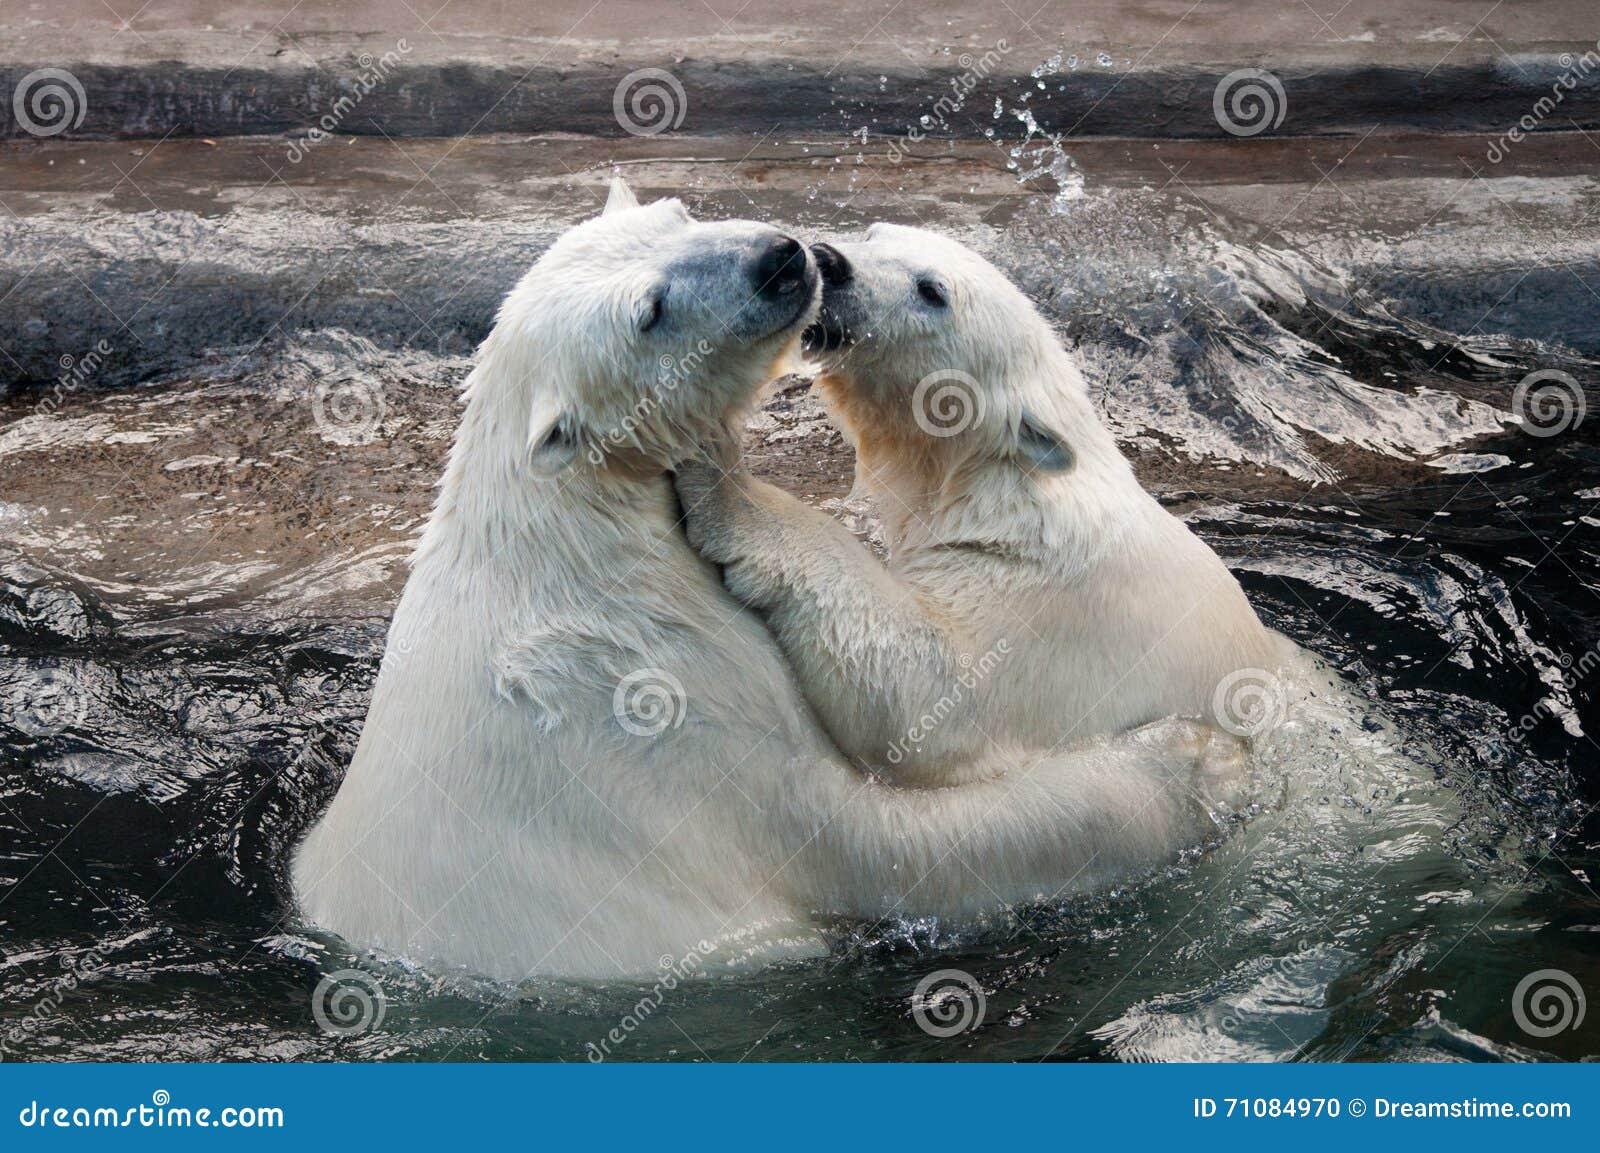 Polar bear cubs in water